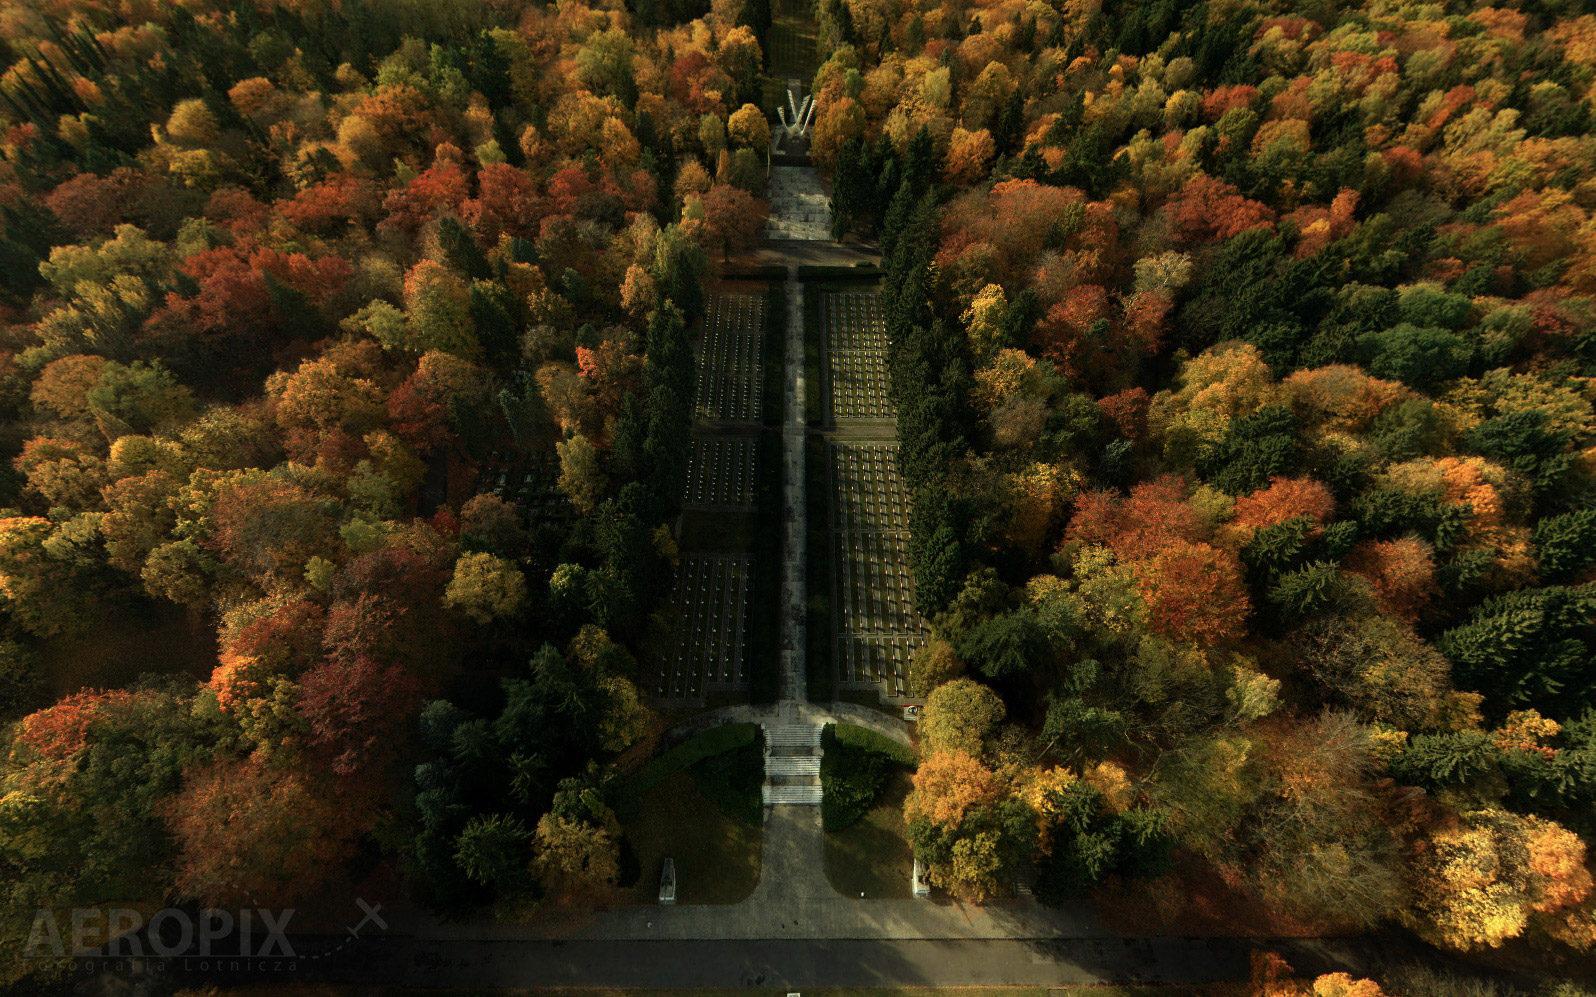 cmentarz_centralny_zdjecia_lotnicze